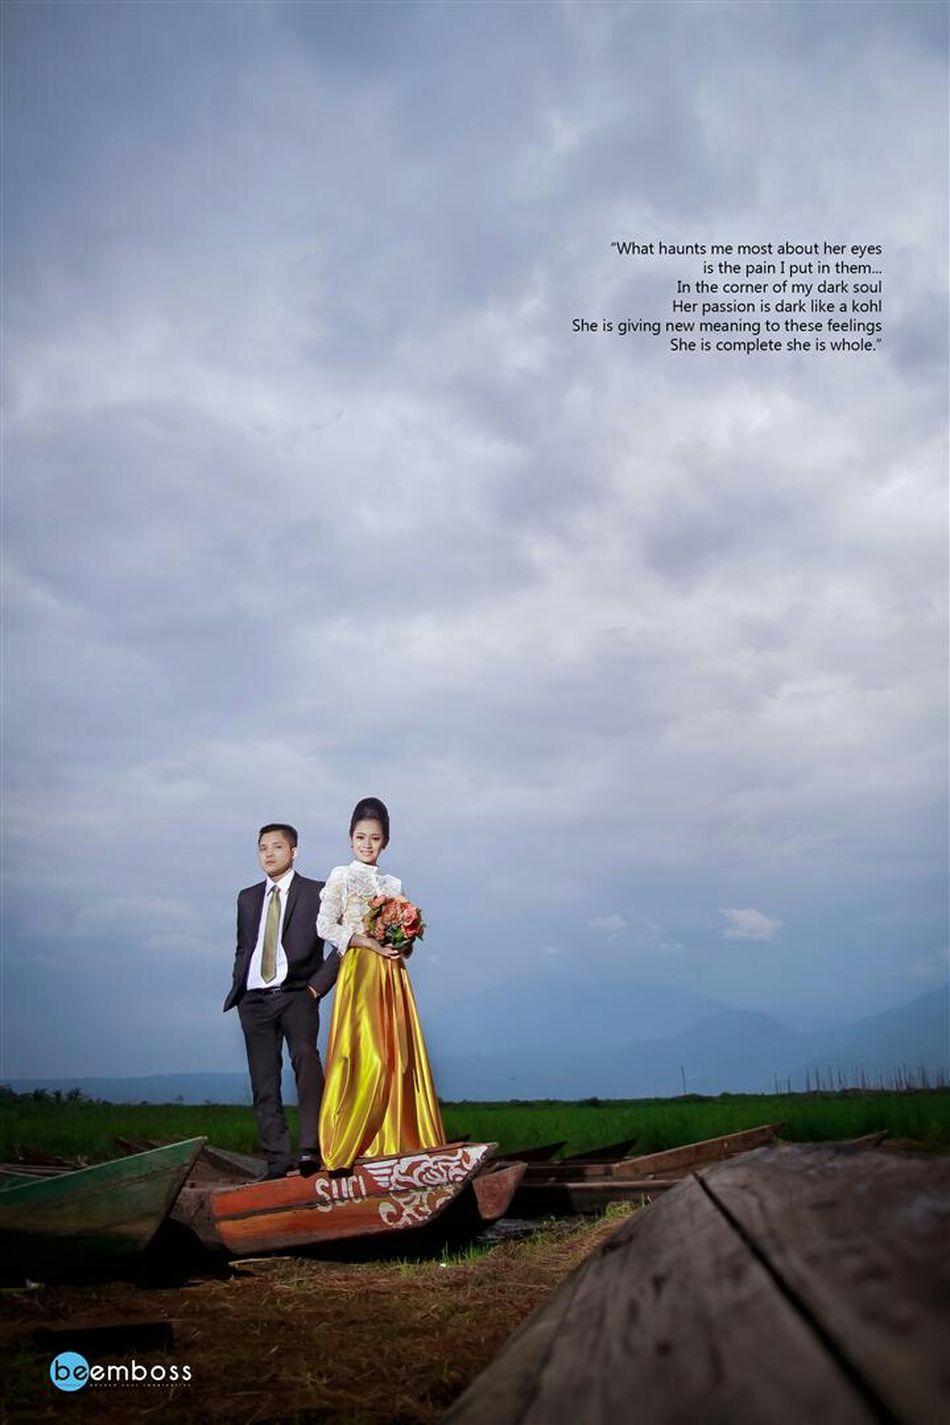 Pipin & Pepen Make up by : Titik Harirustanti Prewedding Beemboss Morning Fresh @bmalit @beemboss Www.beemboss.com Model Today's Hot Look Rawapening #indonesia #centraljava Landscape_Collection Love Hello World